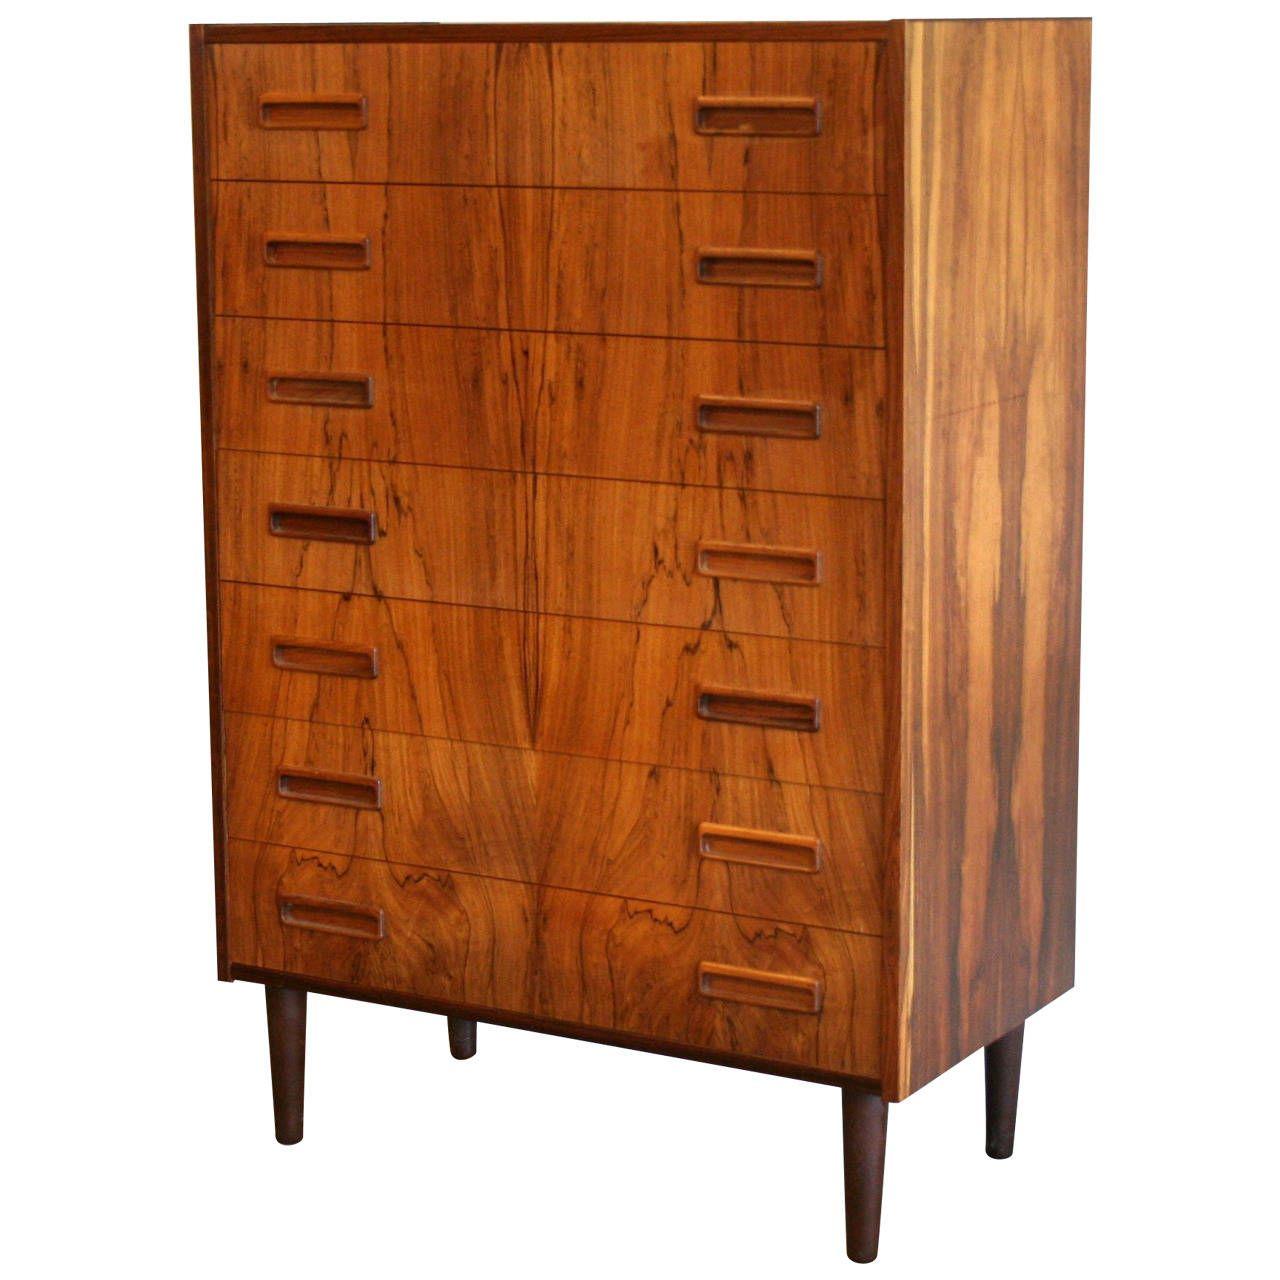 Rosewood Bedroom Furniture Vintage Danish Rosewood Dresser Vintage Furniture And Storage